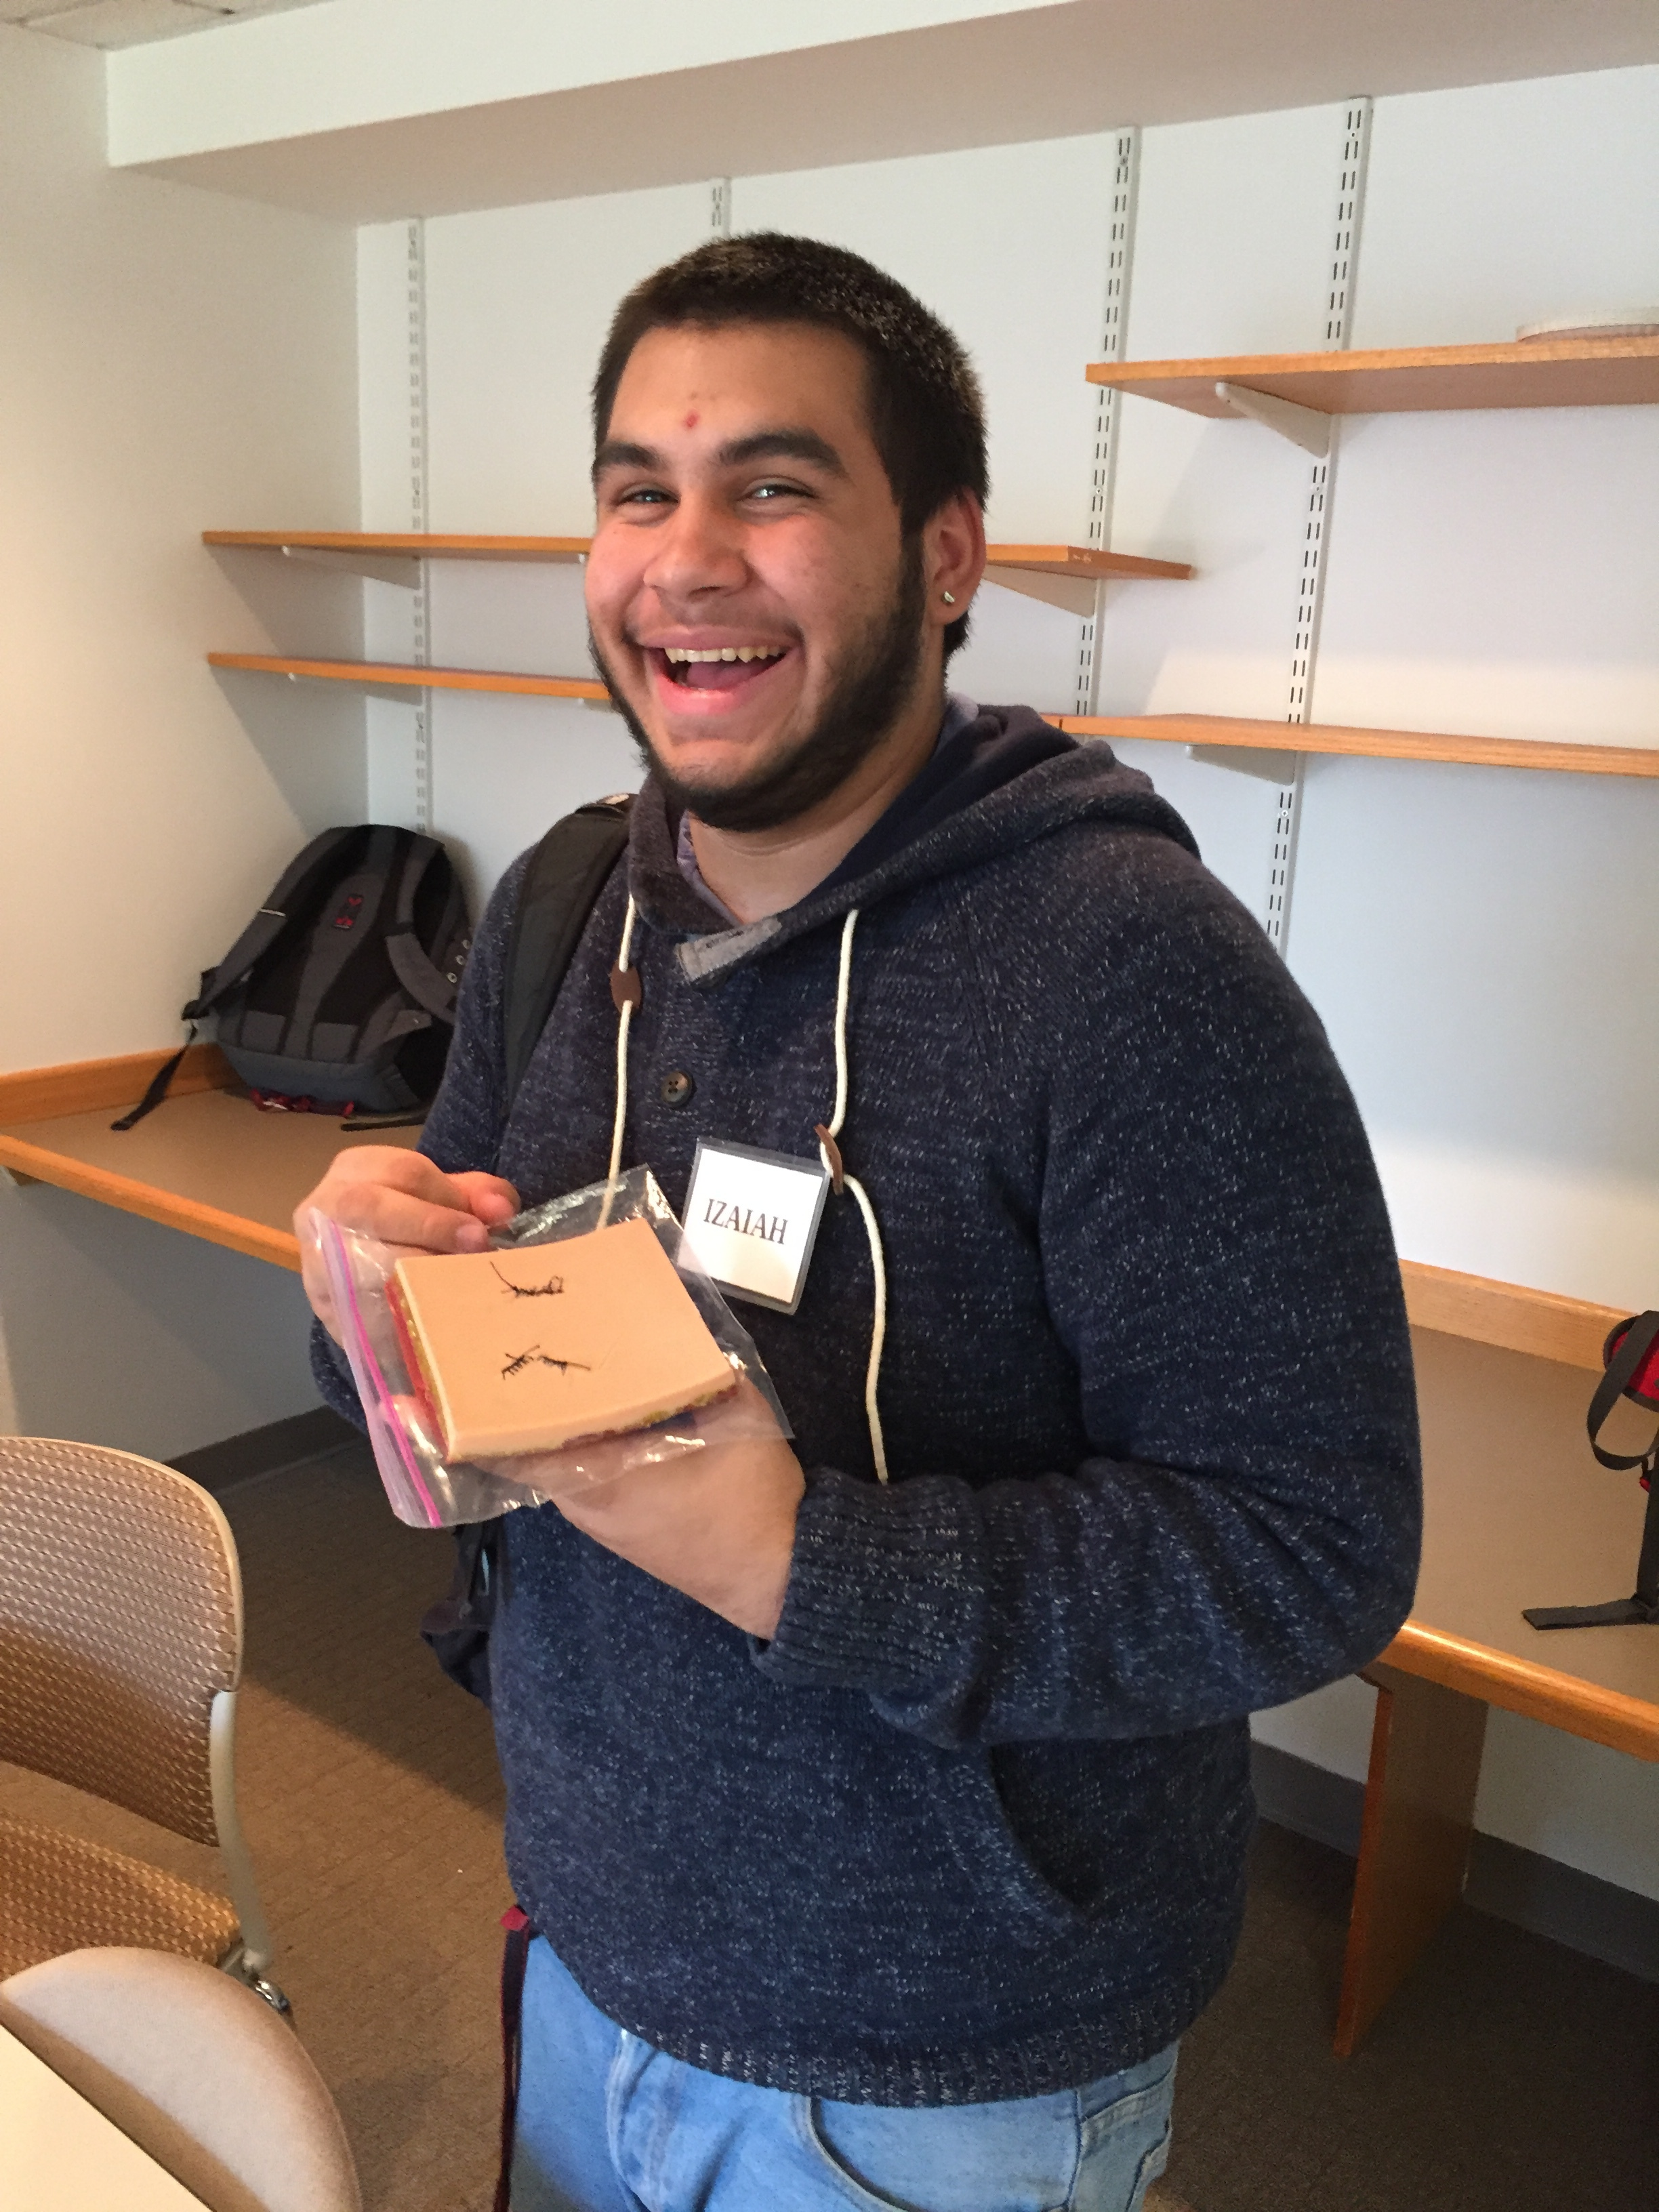 Izaiah, Urban Science Academy senior, proudly displays his suturing skills